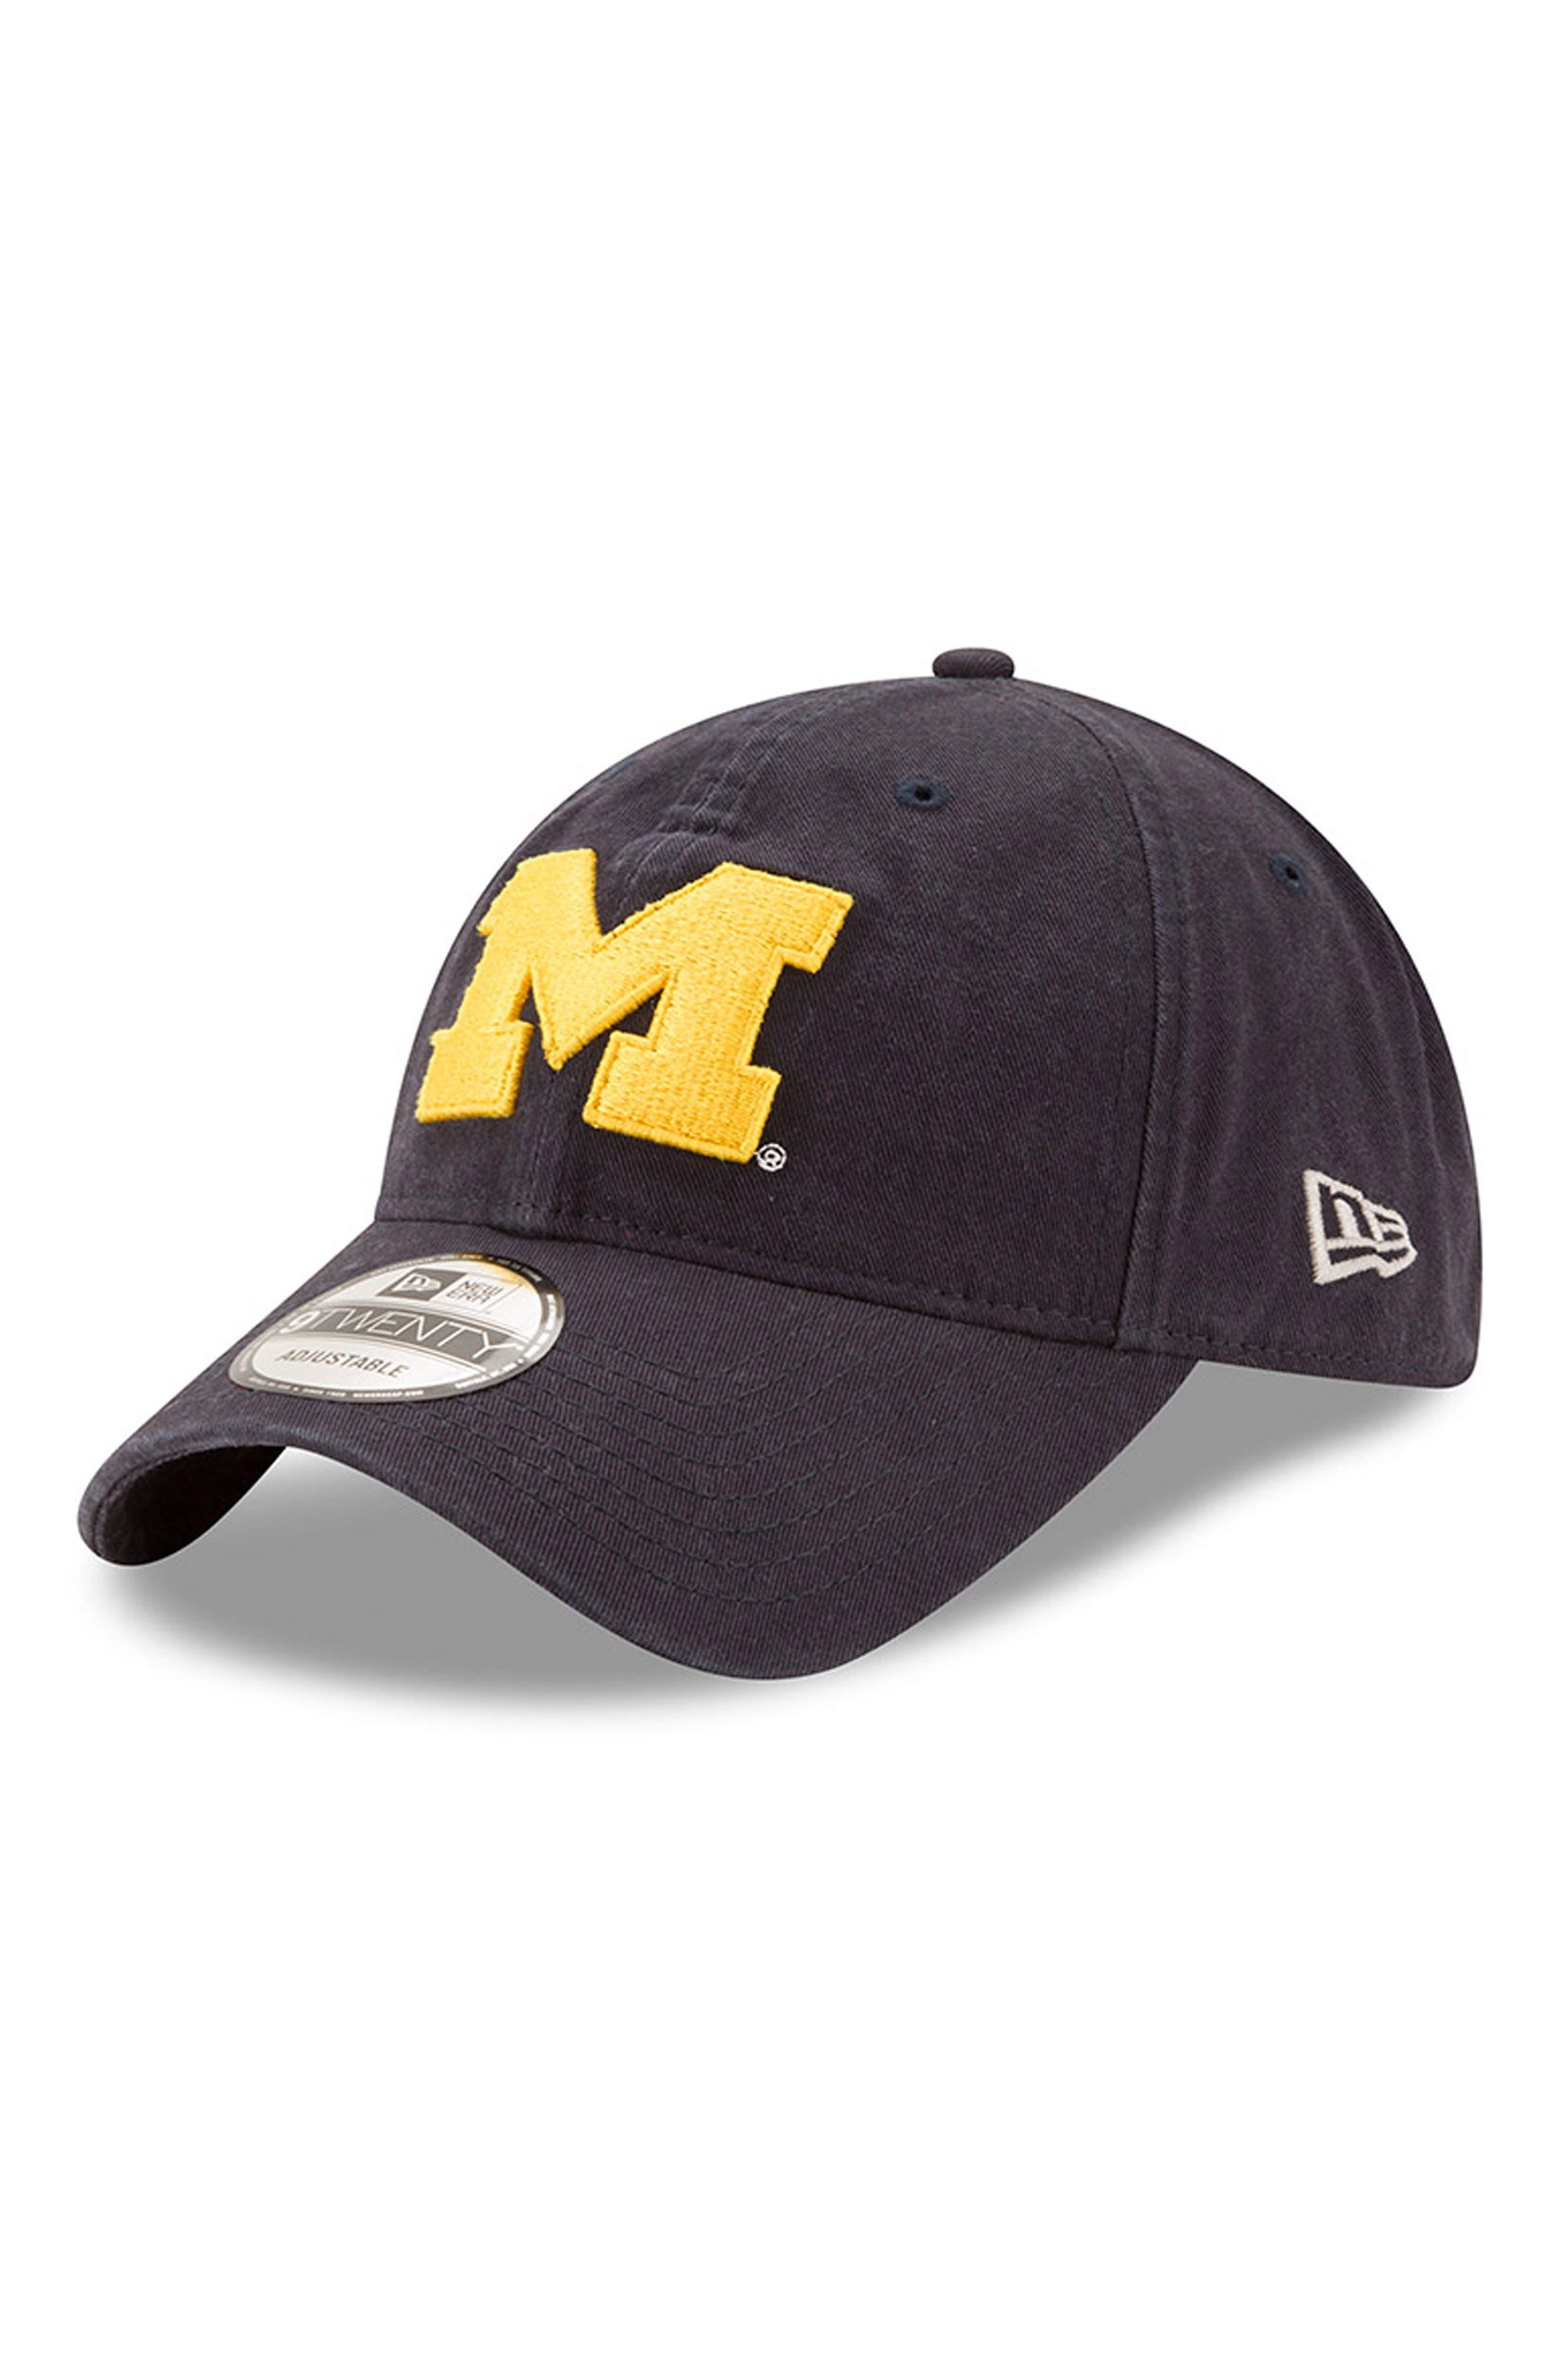 New Era Collegiate Core Classic - Michigan Wolverines Baseball Cap